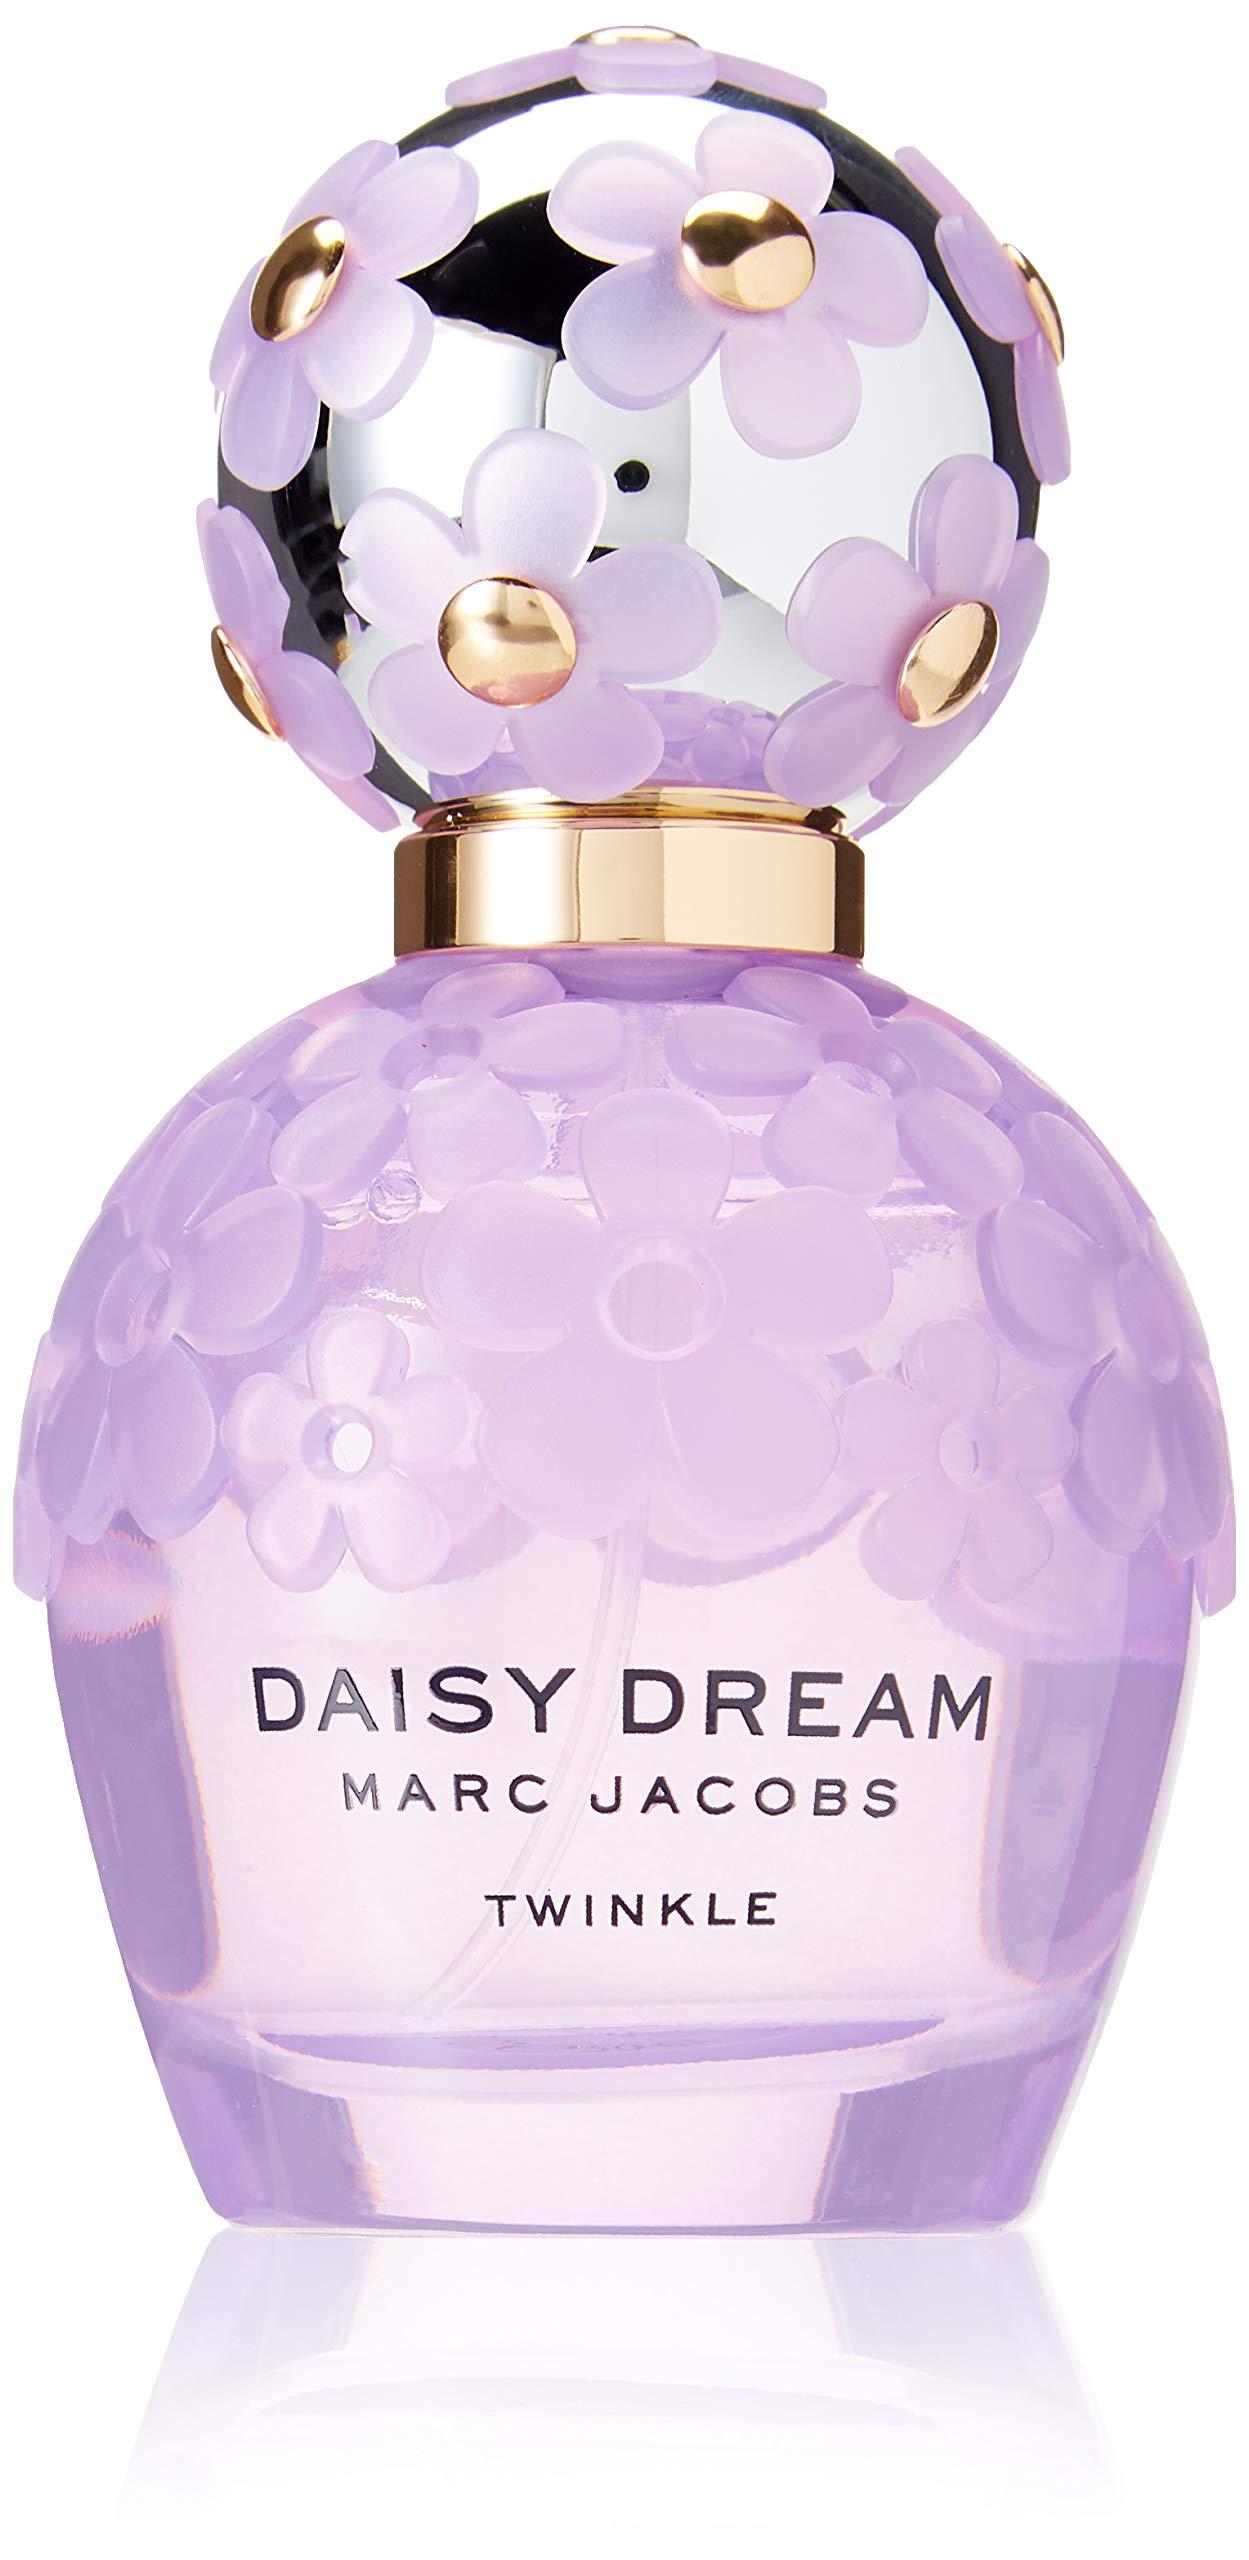 Marc Jacobs Marc Jacobs Daisy Dream Twinkle for Women Eau de Toilette Spray, 1.7 Ounce (New)